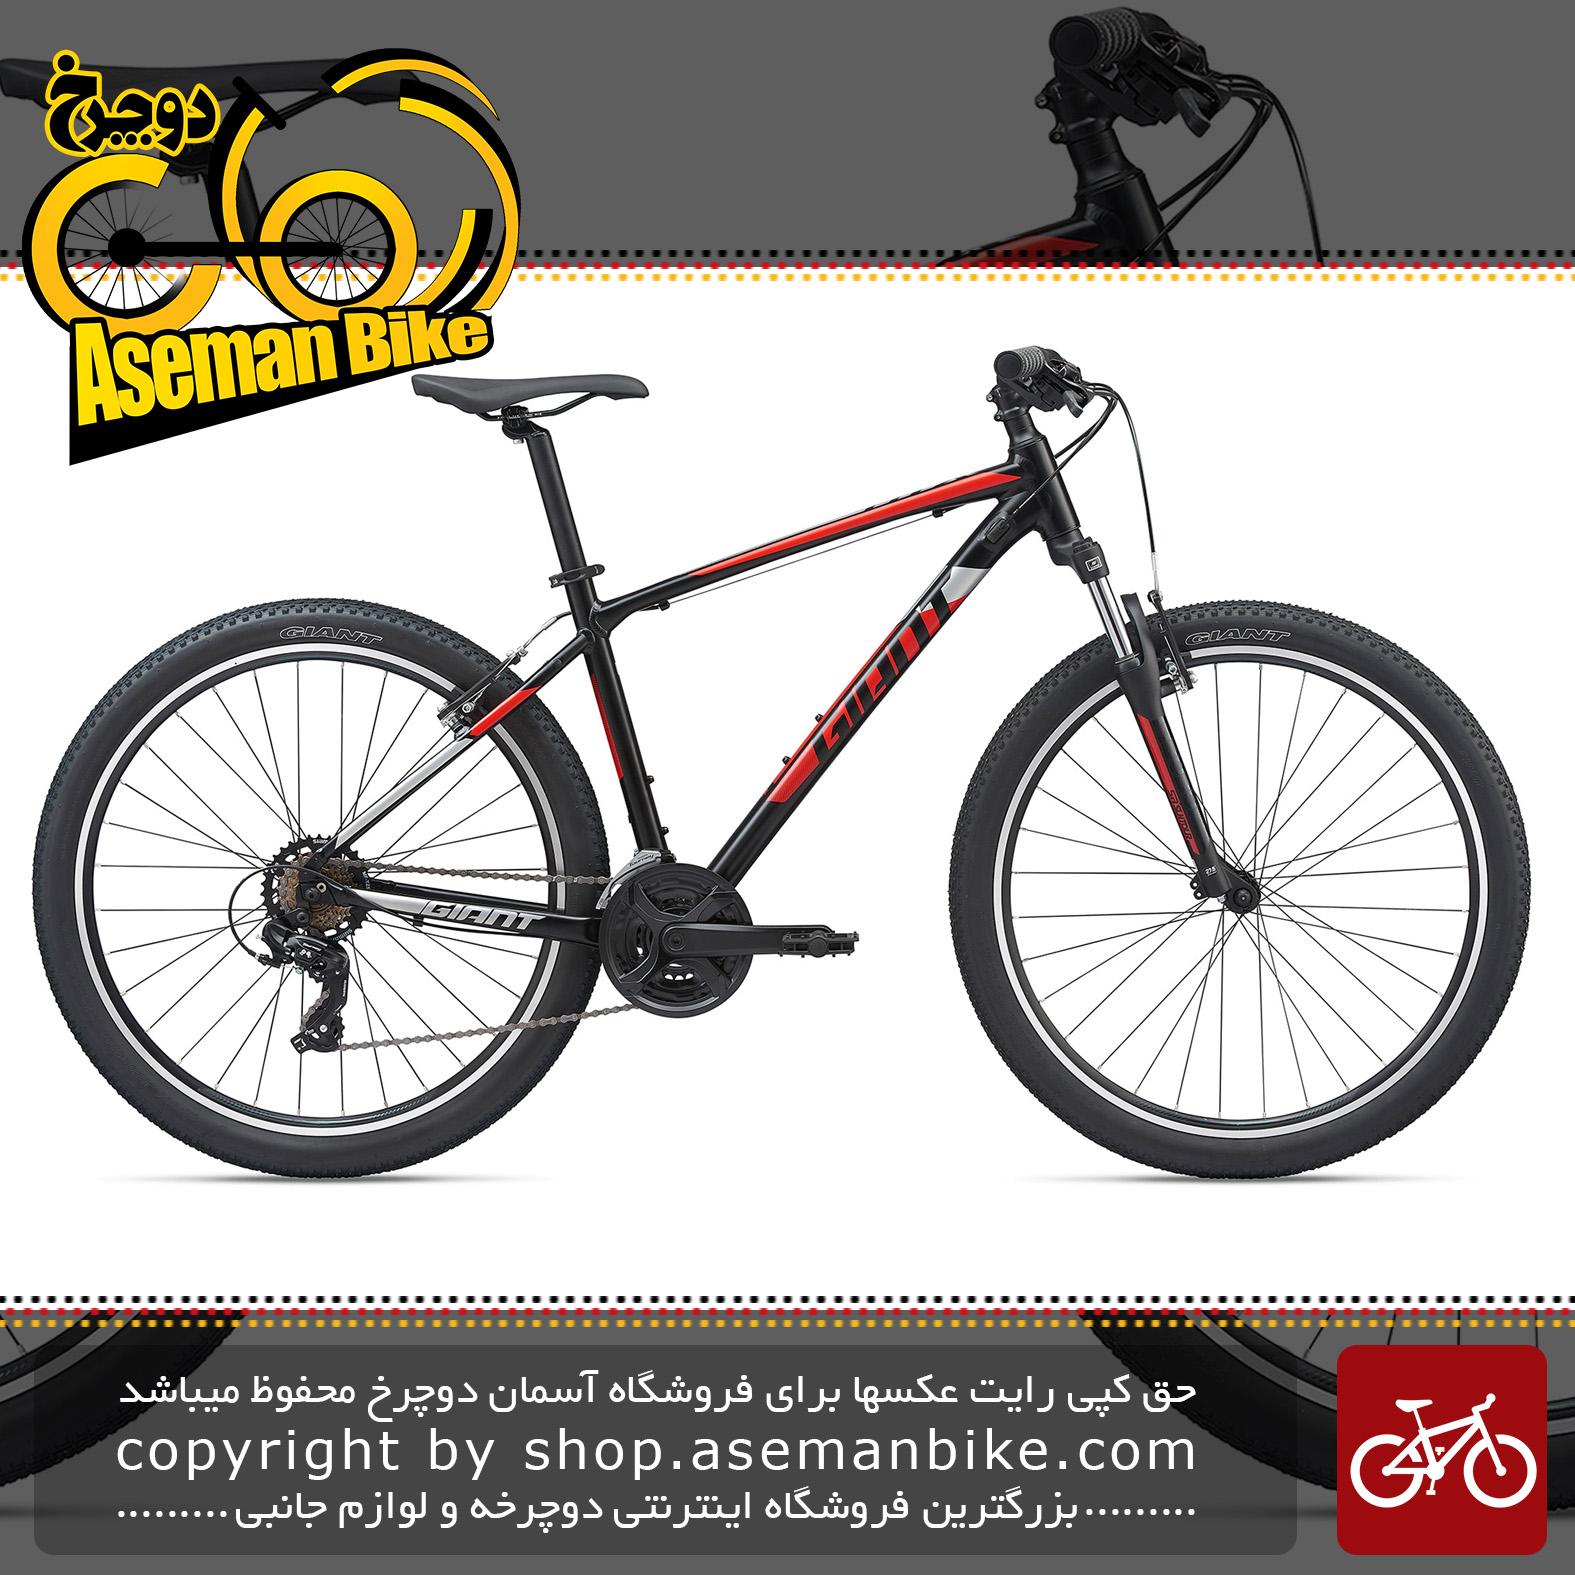 دوچرخه کوهستان جاینت مدل ای تی ایکس 3 2020 Giant Mountain Bicycle ATX 3 2020